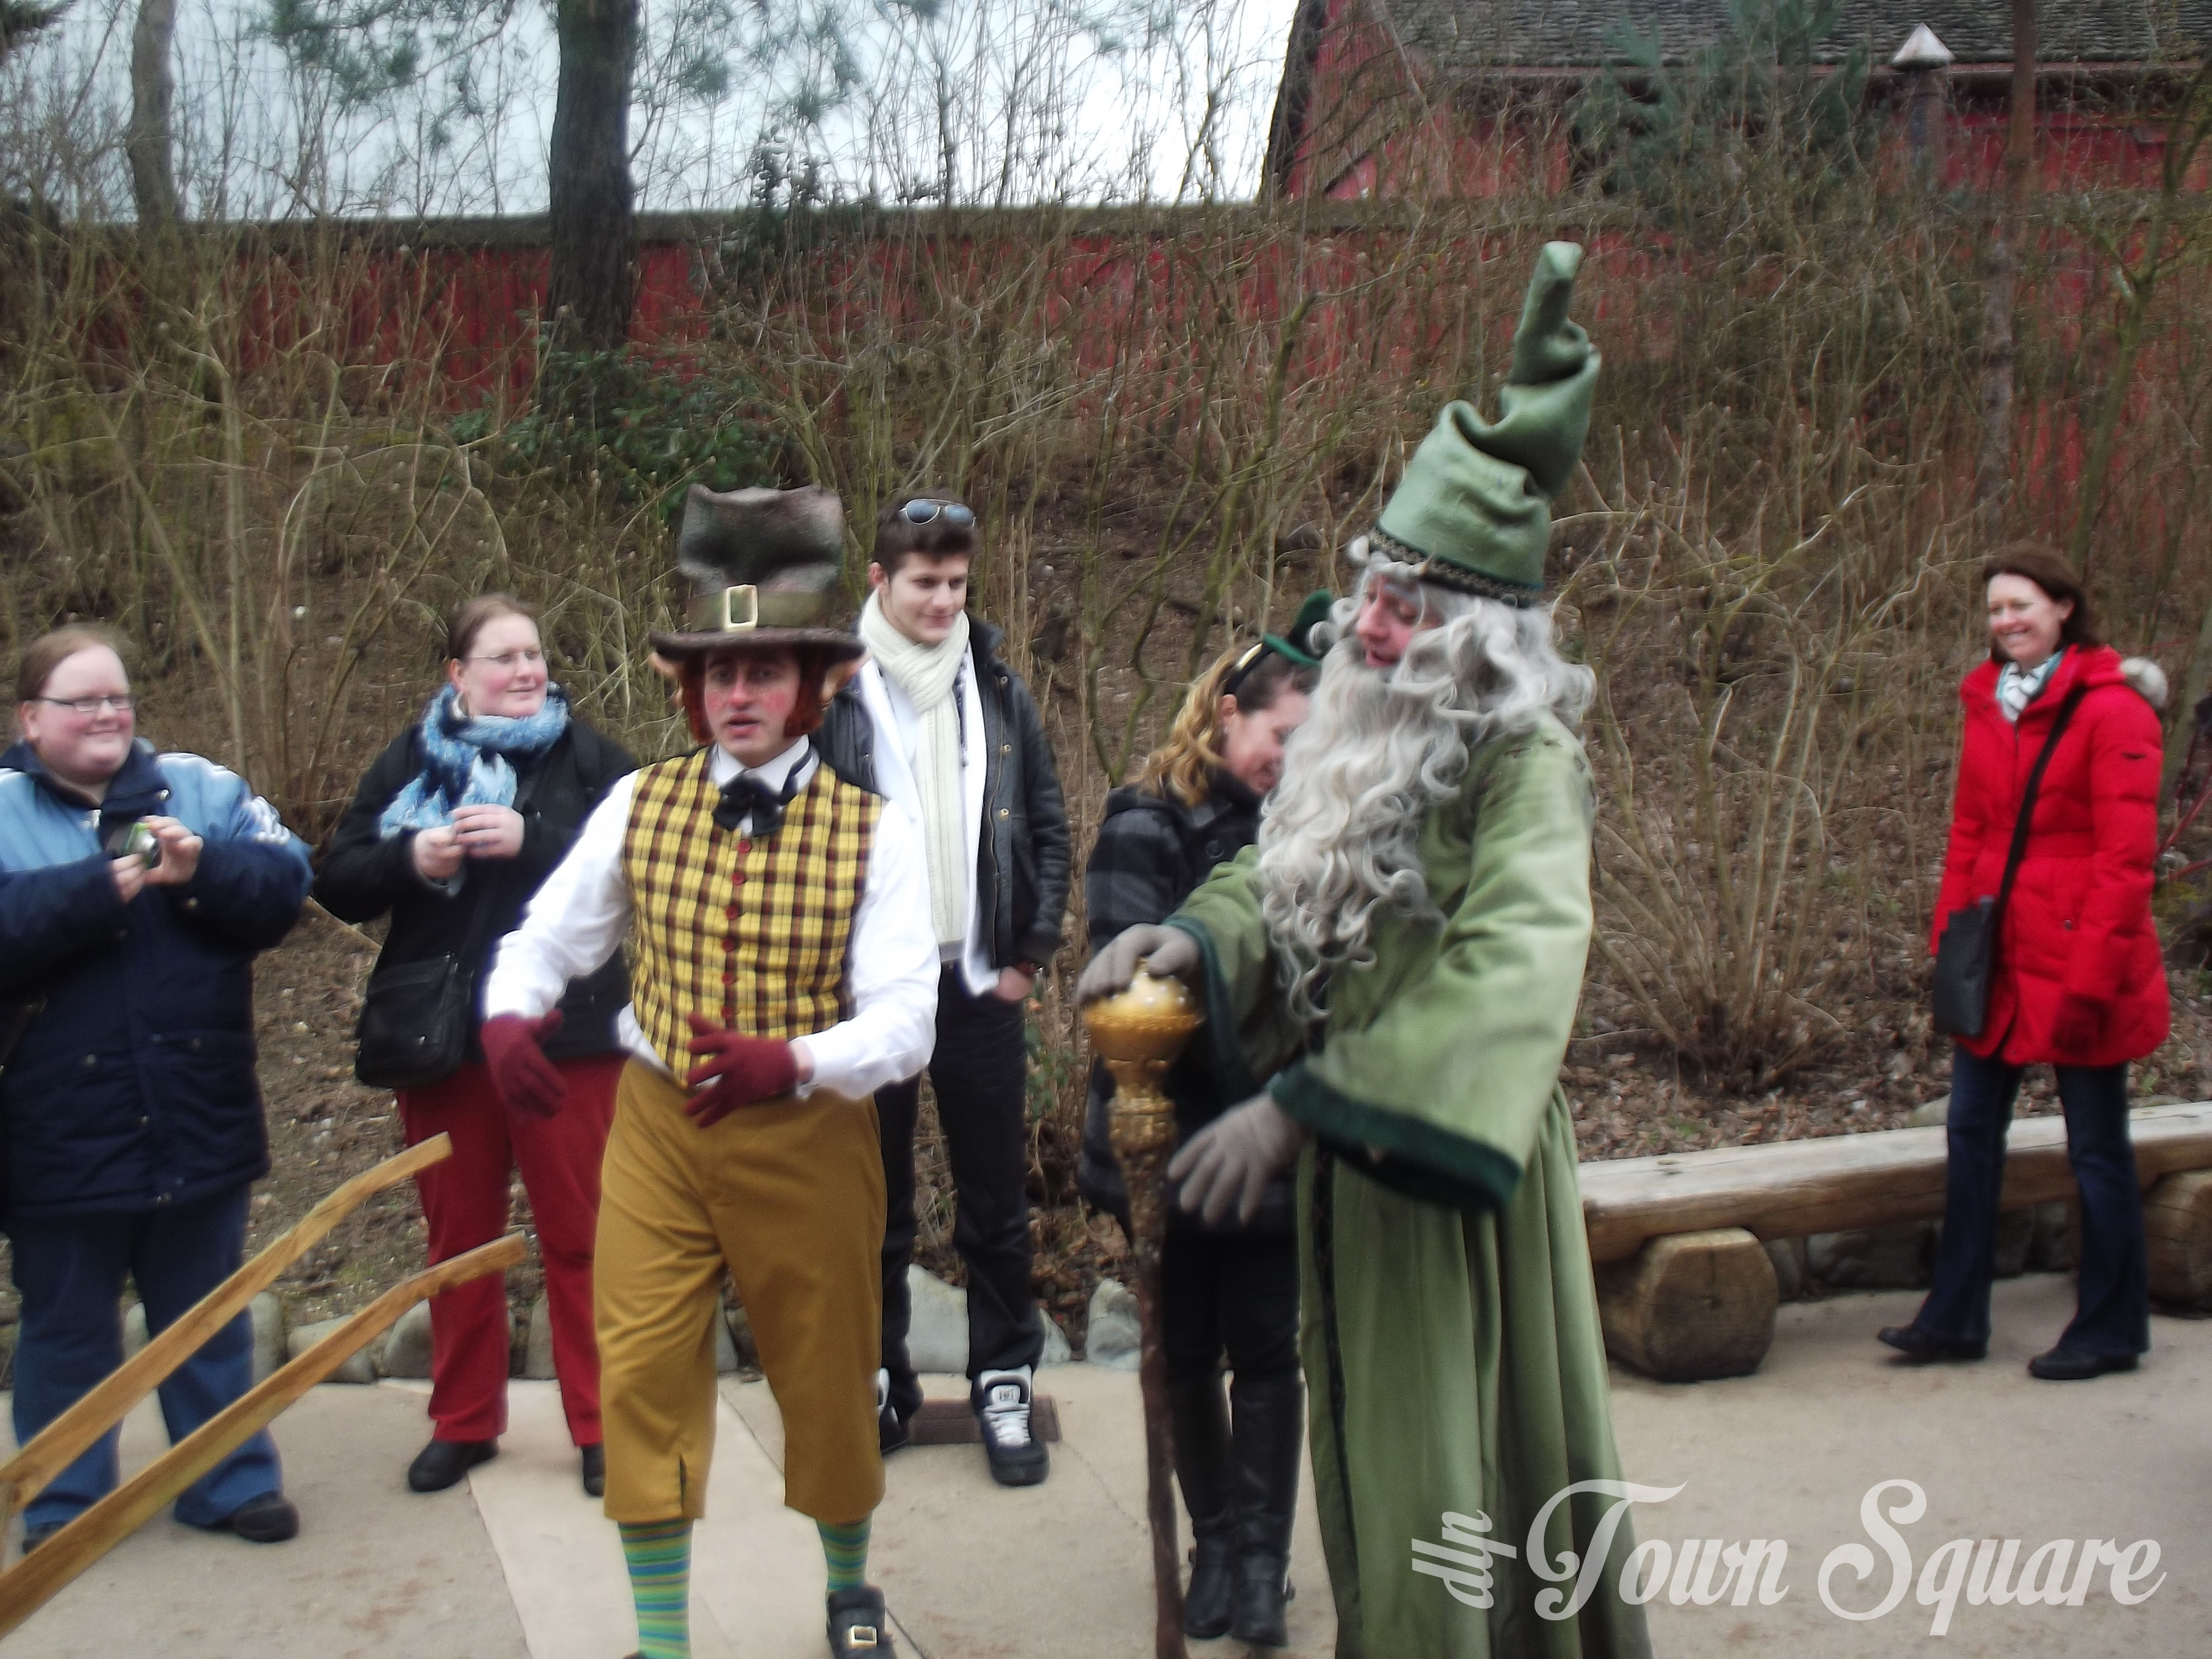 St. Patricks Day leprechauns at Disneyland Paris